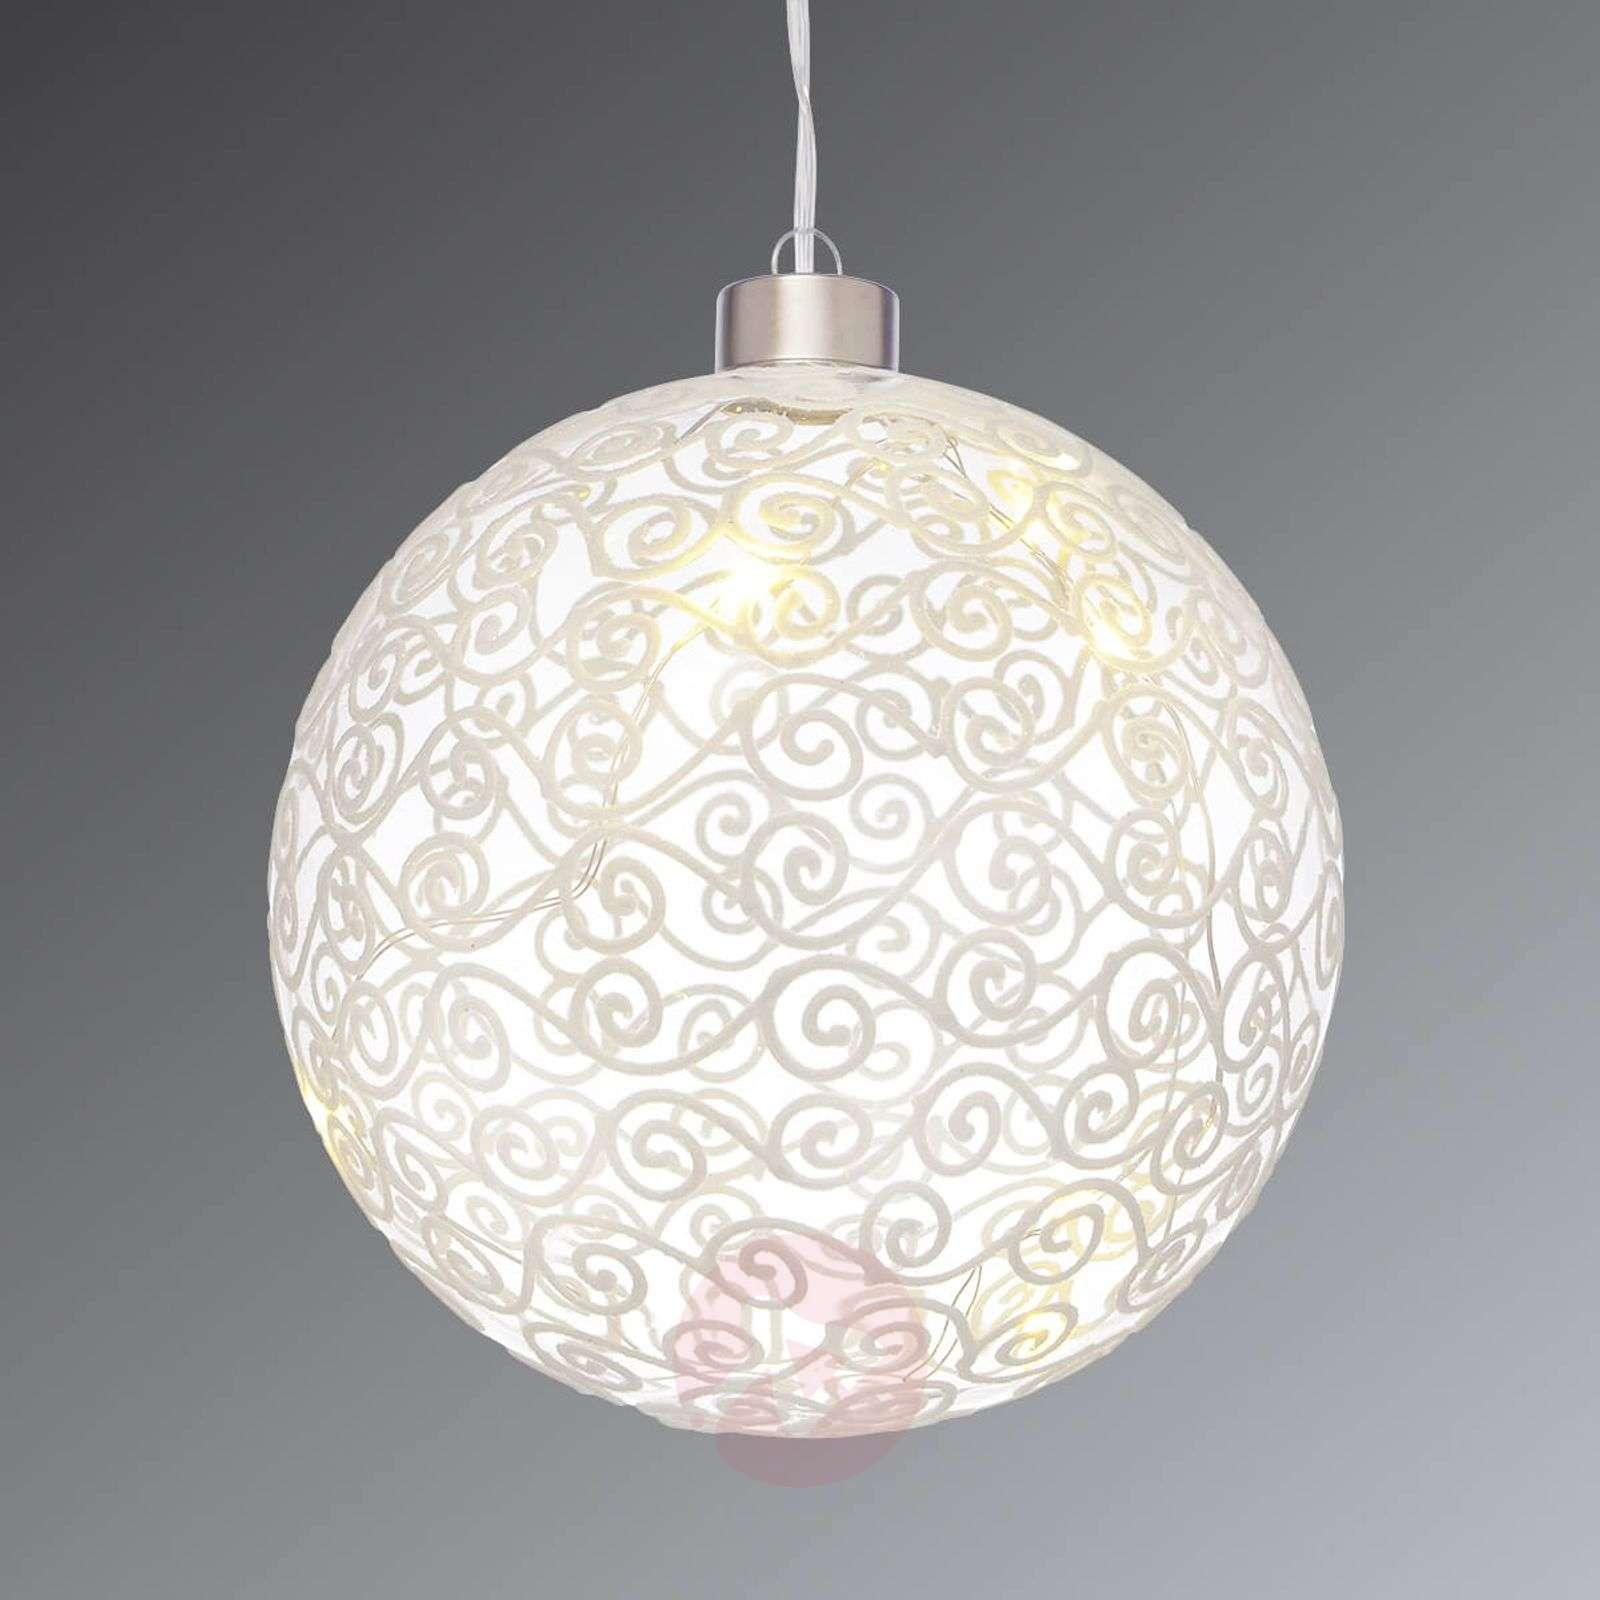 light attractive ie decor lights en decorative starling